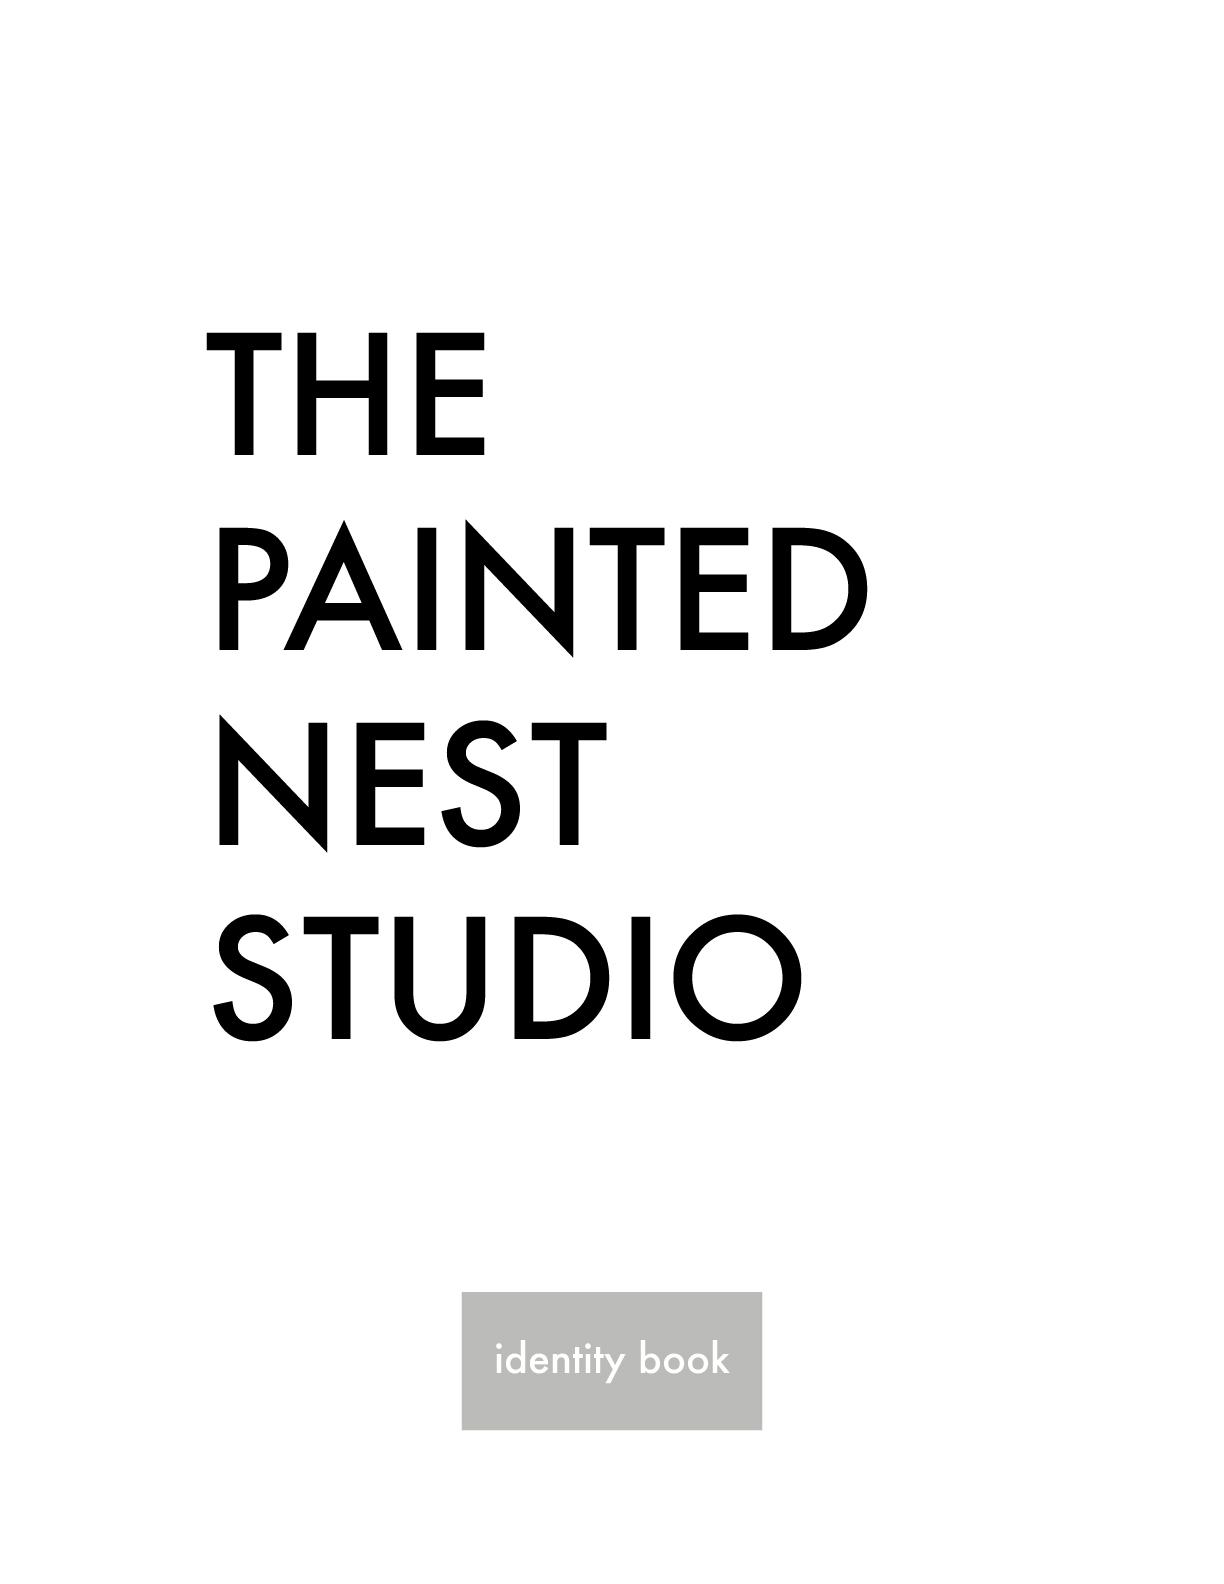 the painted nest studio identity book